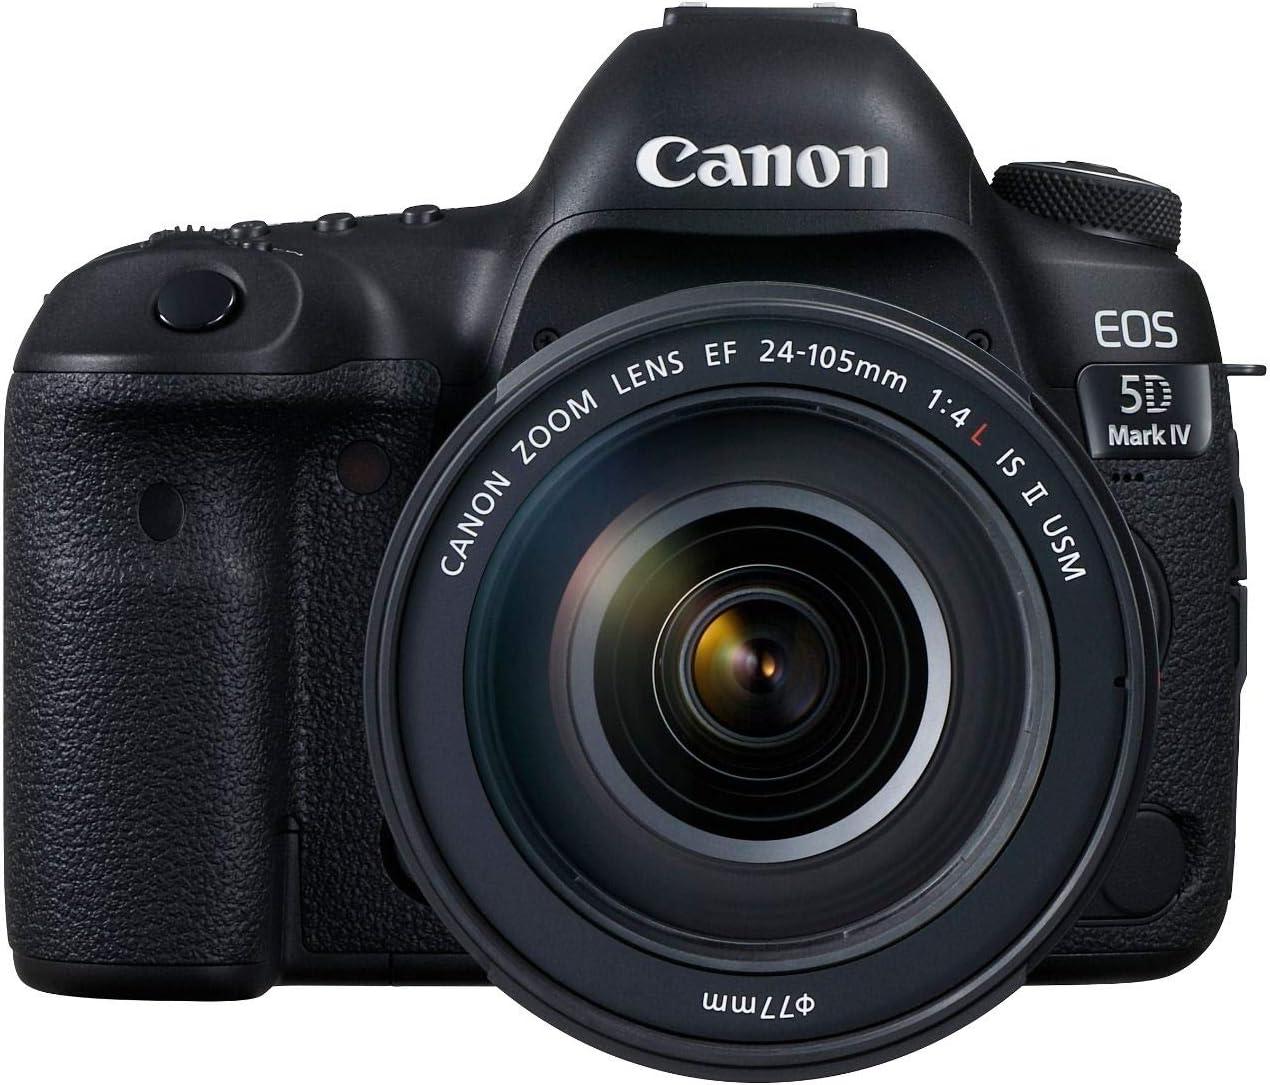 Canon 5D Mark IV | Best Makeup Camera (Editor's Choice)